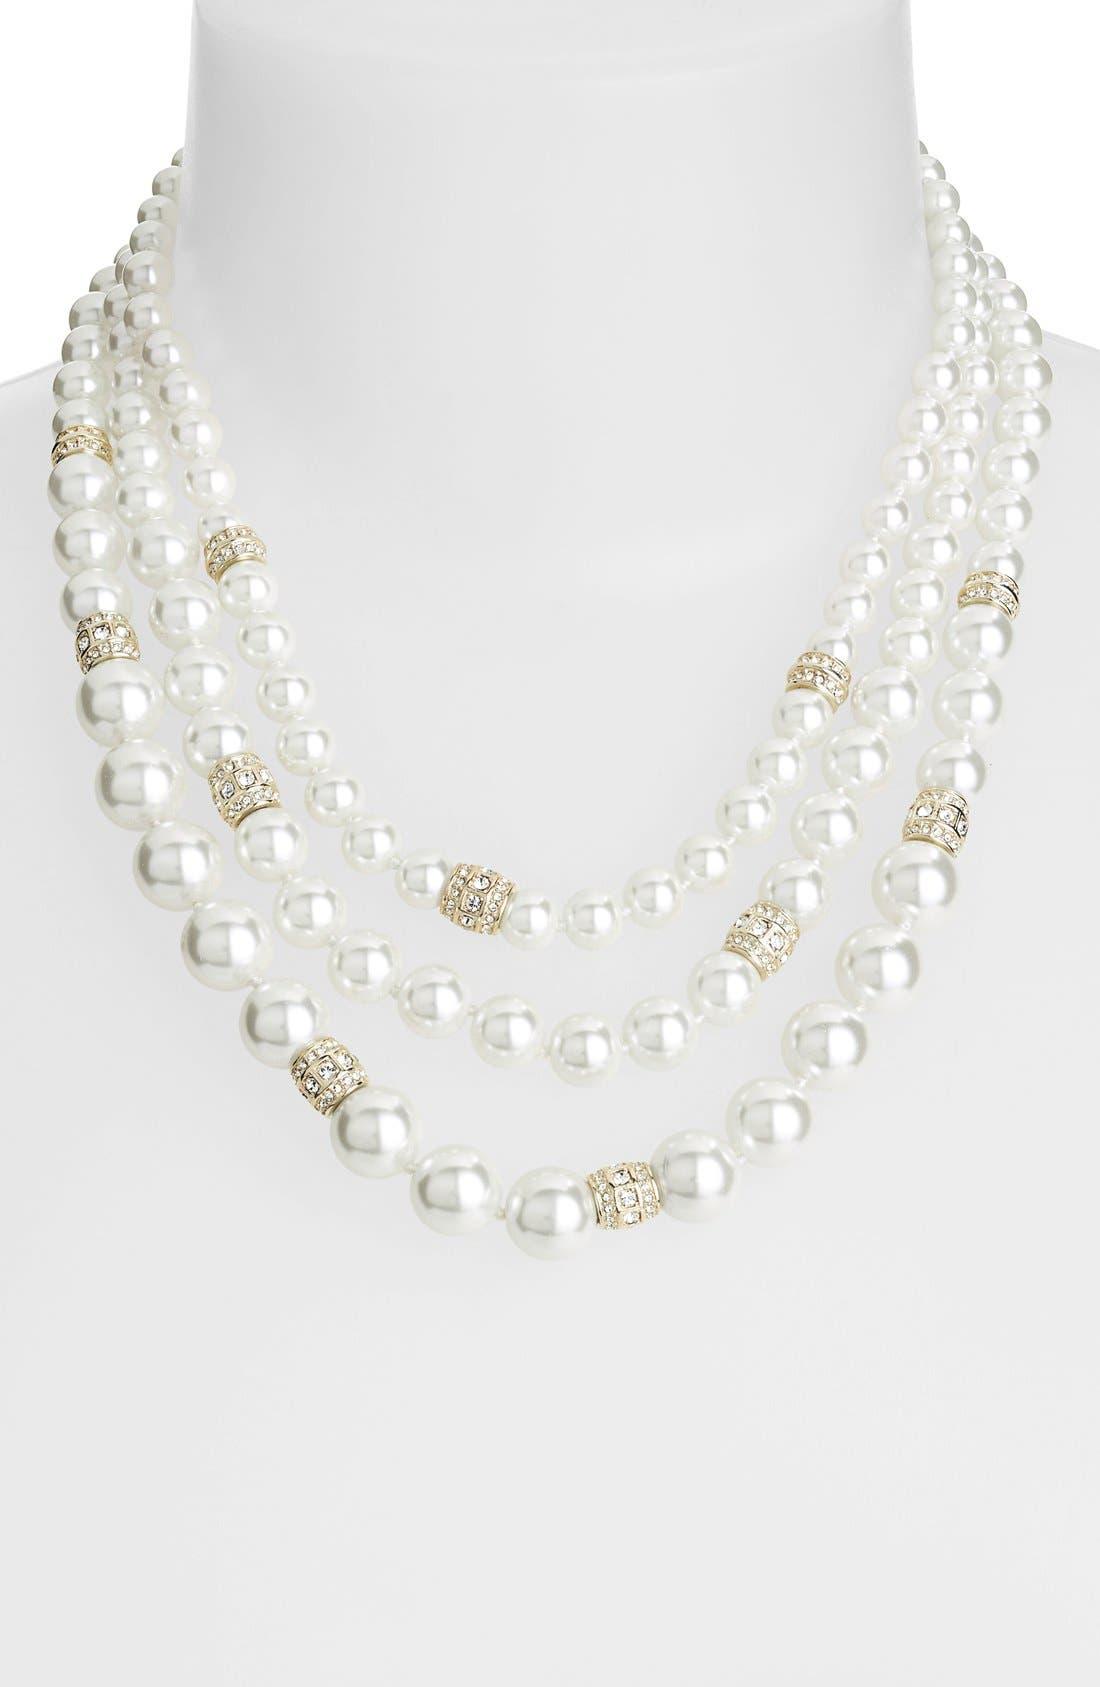 Main Image - Judith Jack 'Gala' Three-Row Faux Pearl Necklace